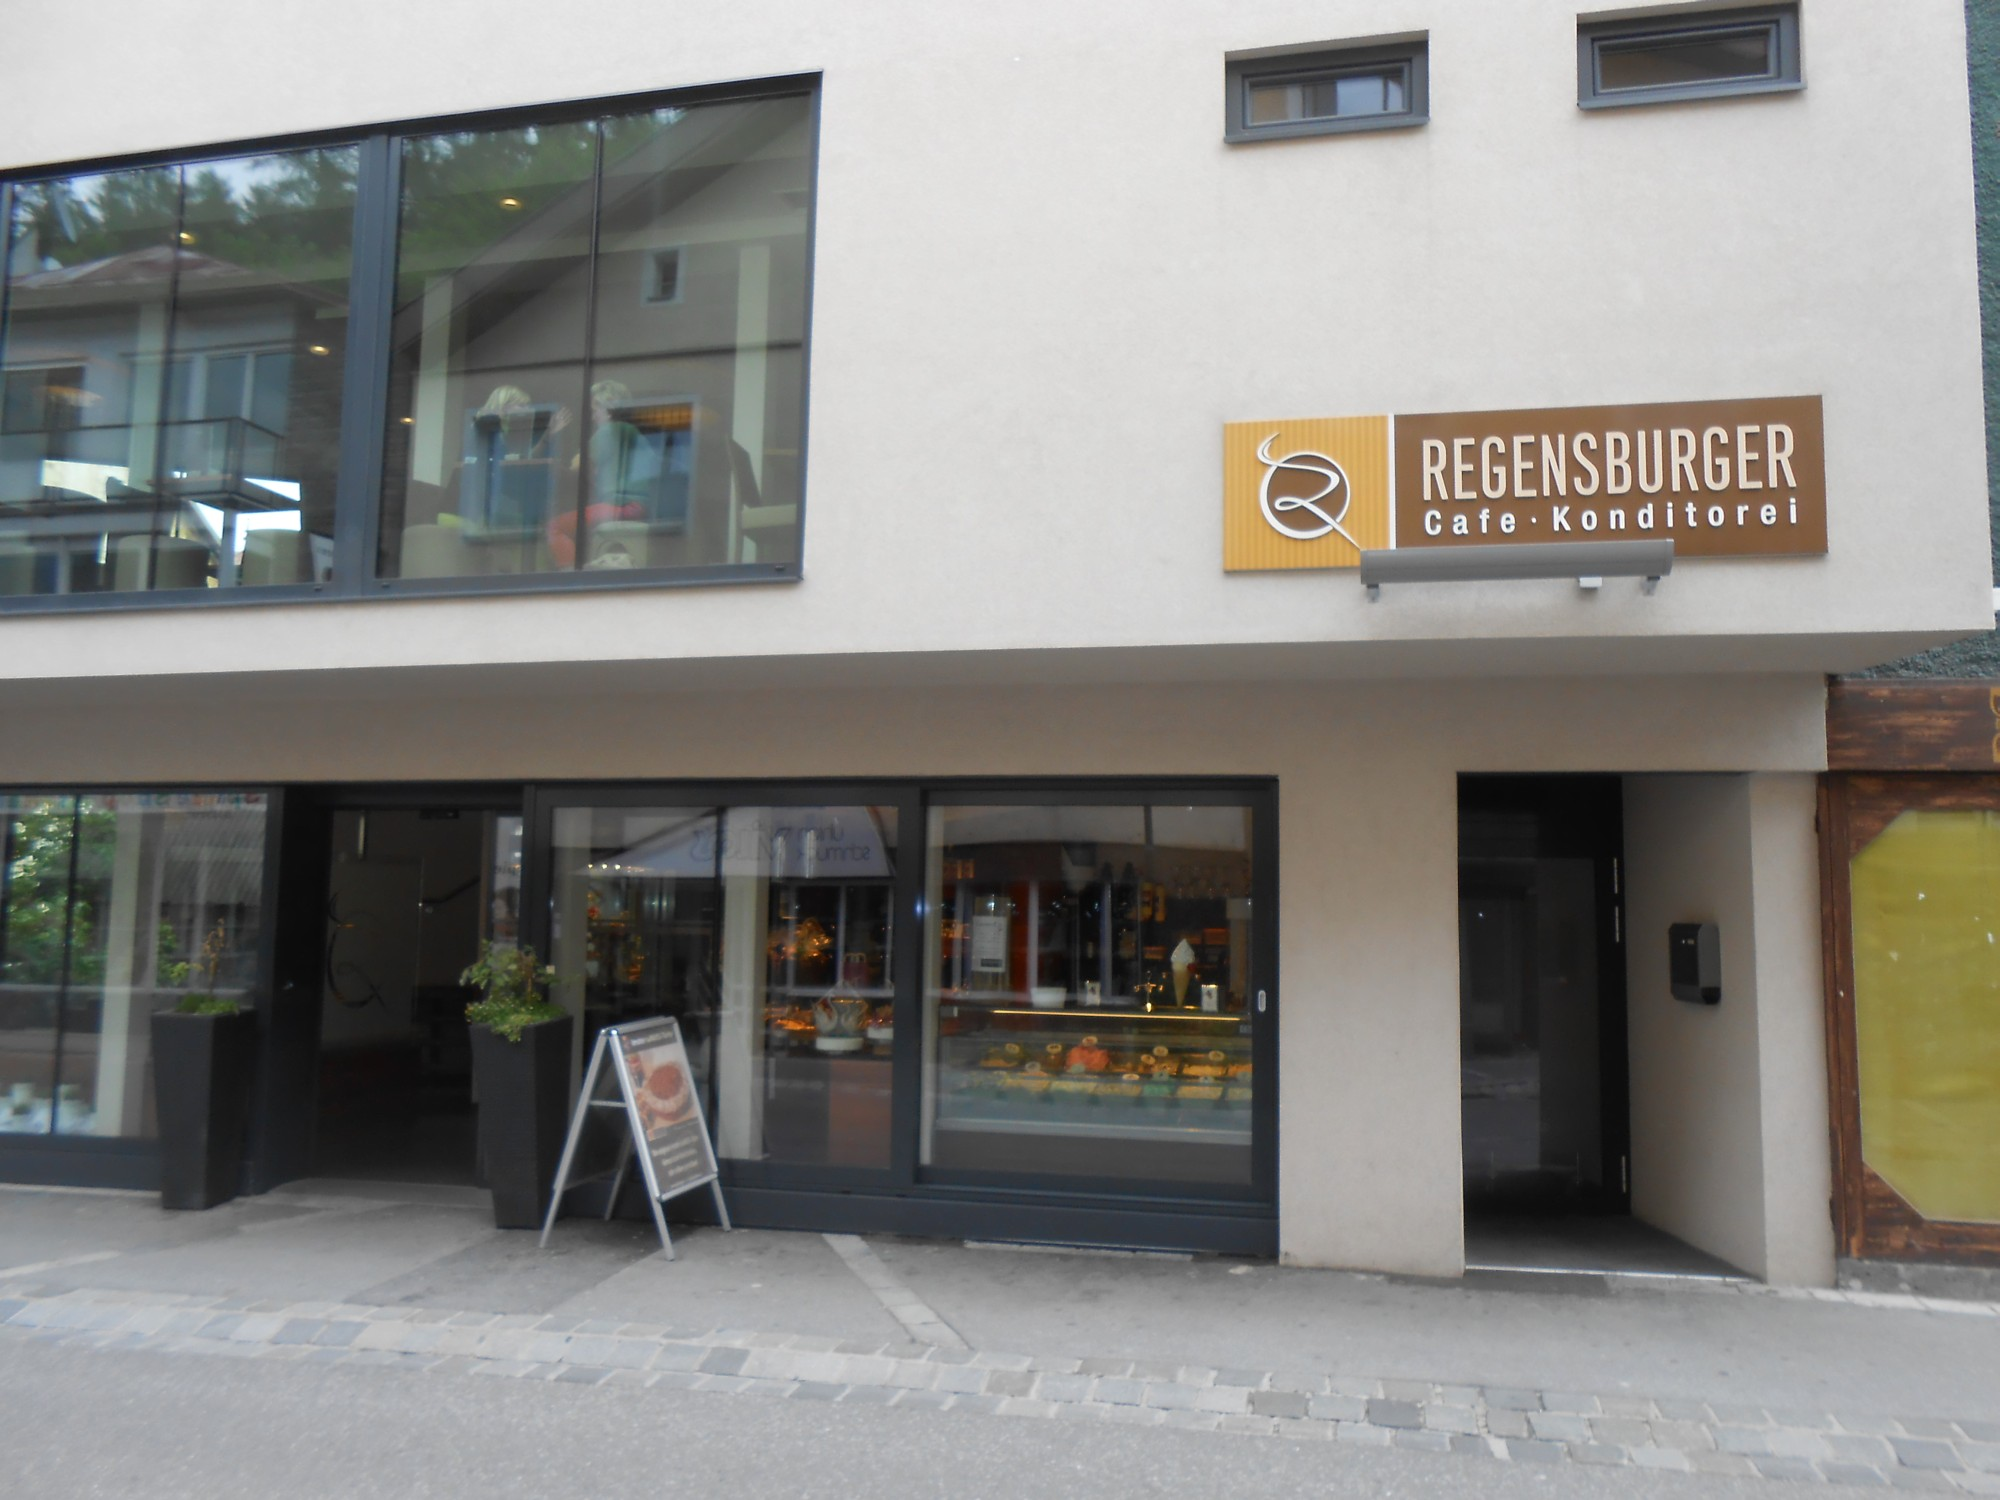 Konditorei Regensburg